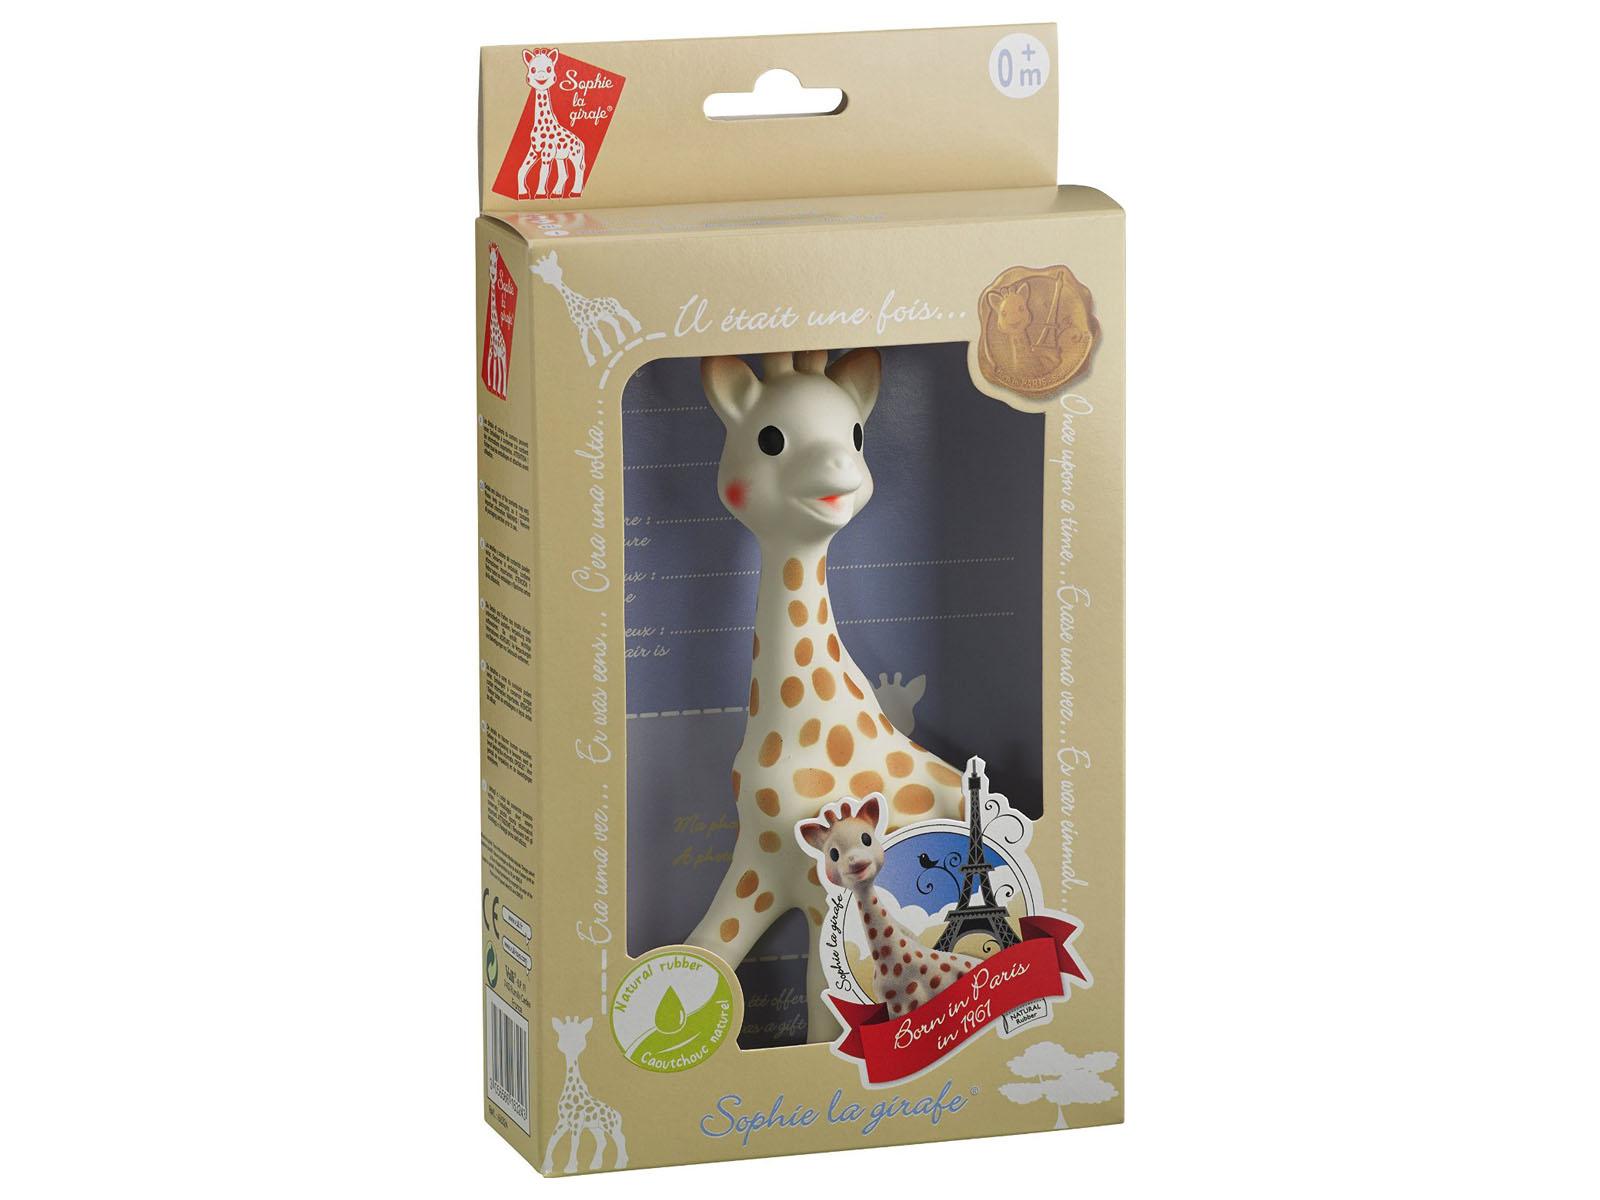 Spiel Giraffe